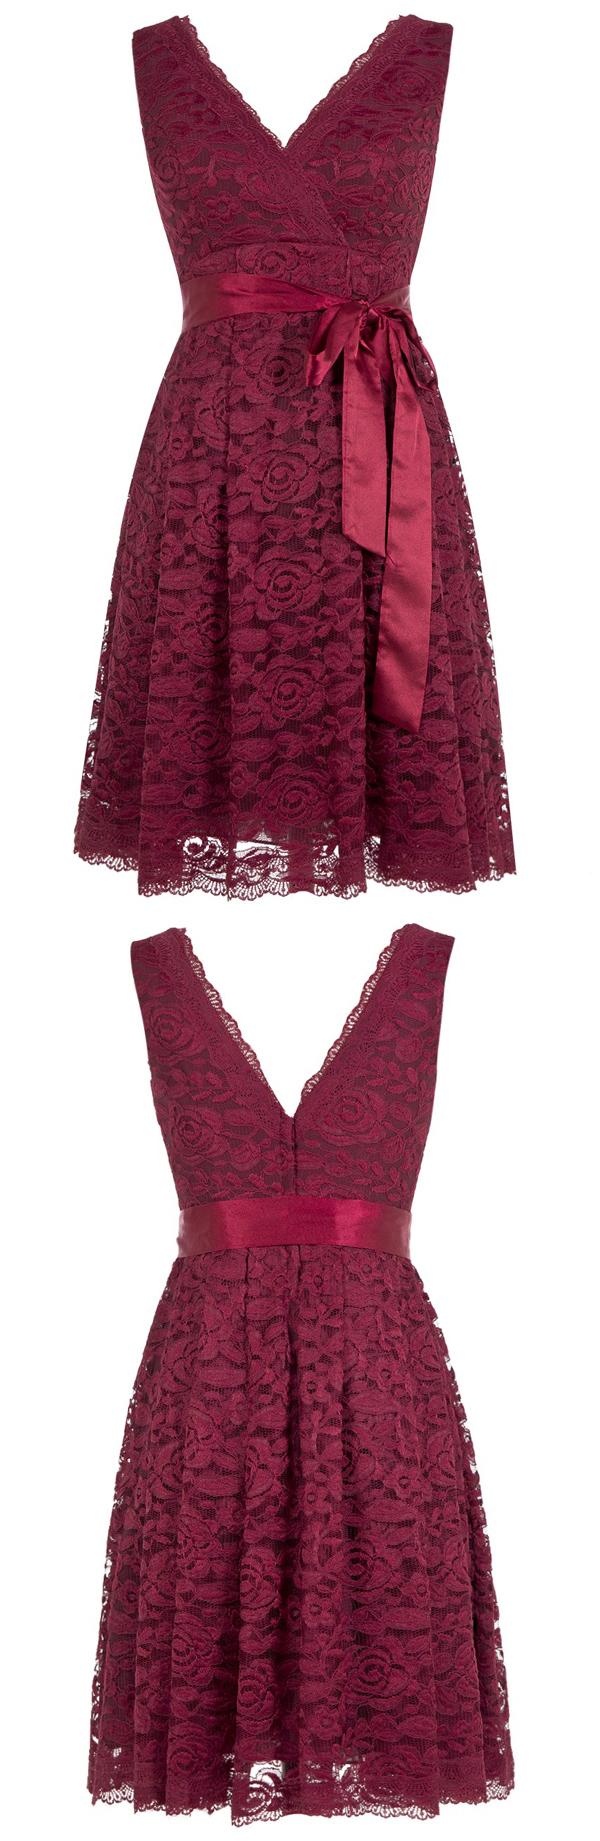 Modren A-line V-neck Short Burgundy Bridesmaid Dress With Lace ...